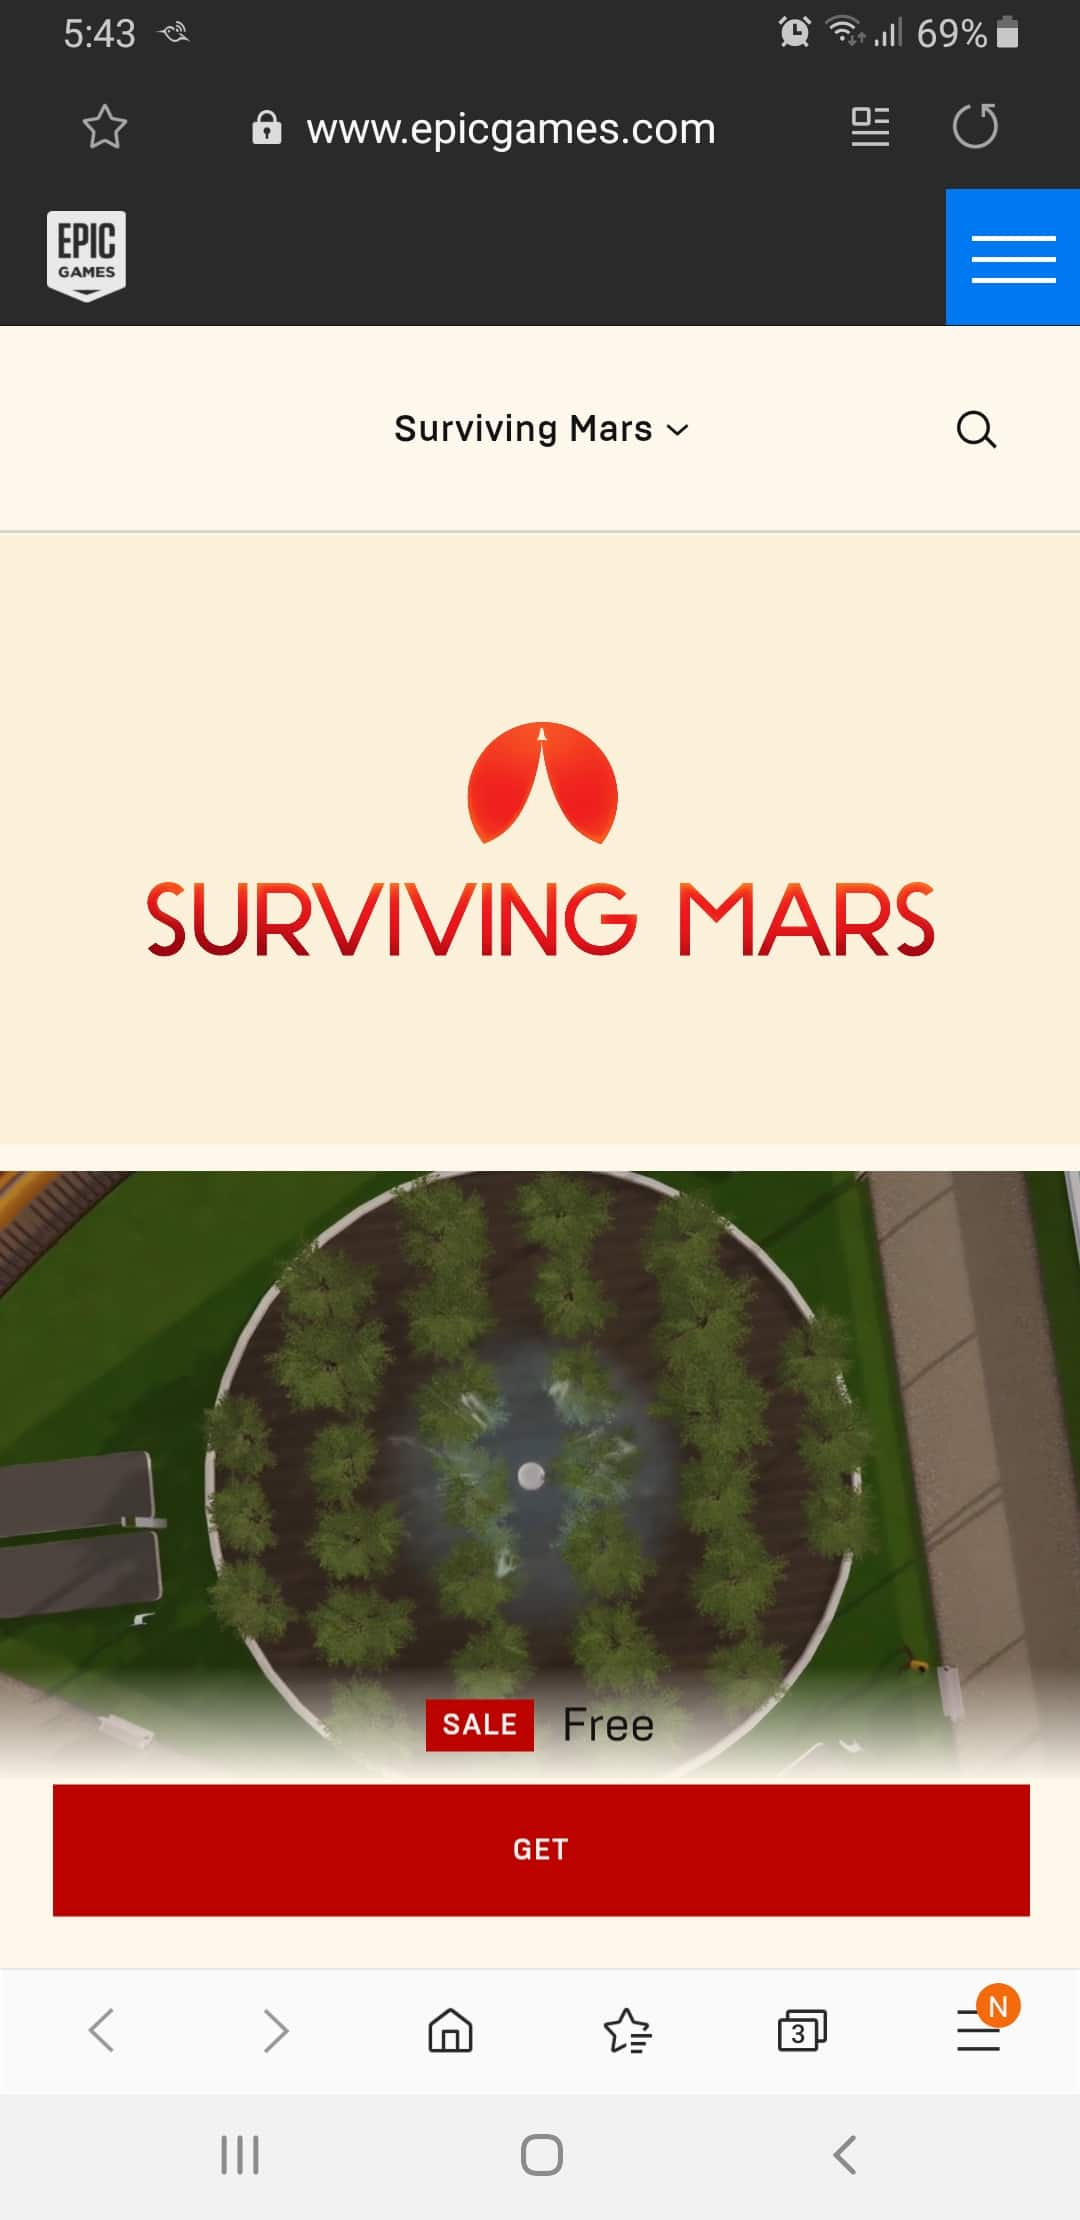 disregard already posted Surviving Mars free PC game